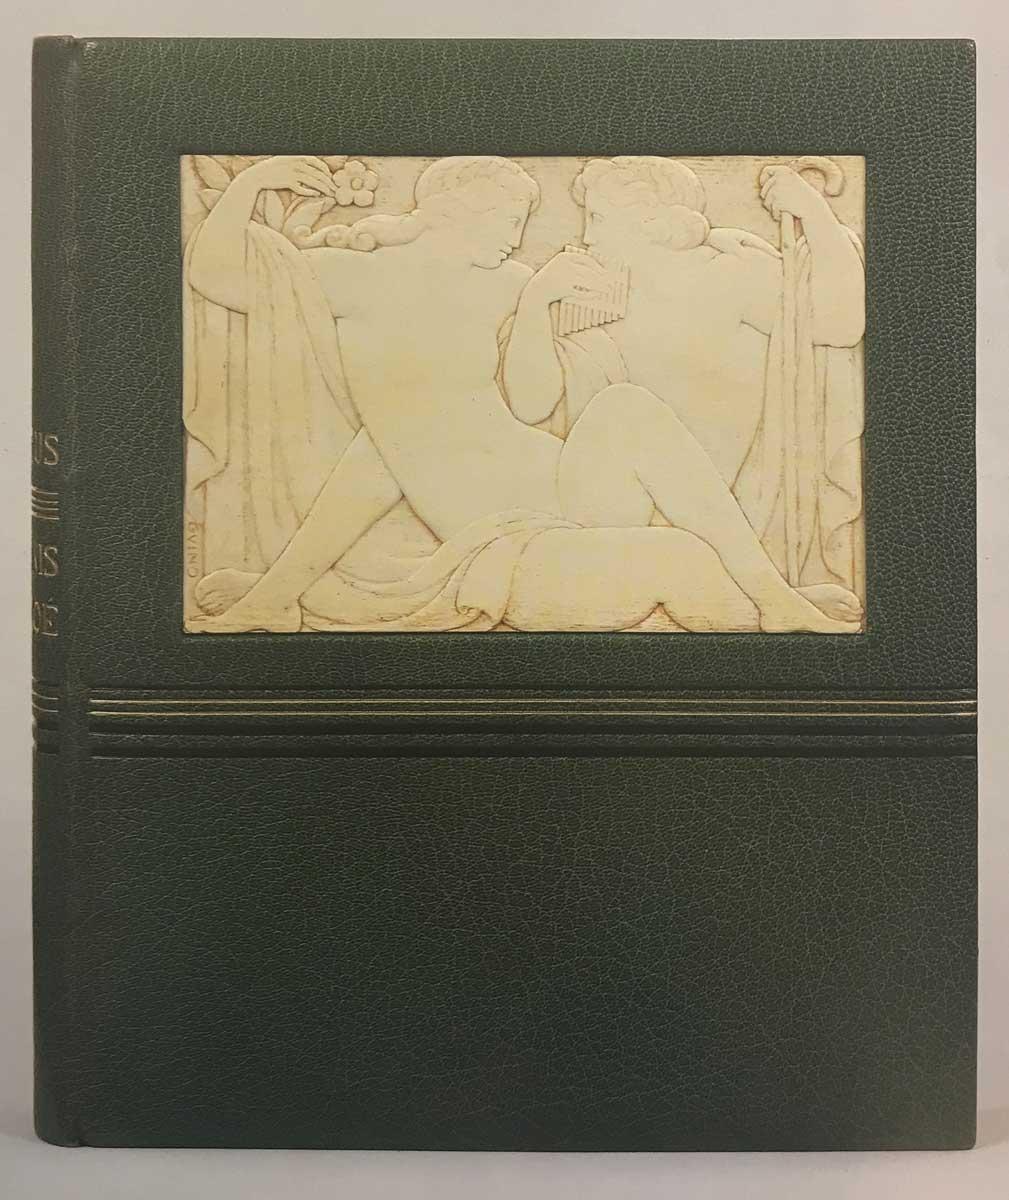 Daphnis et Chloé - Richard Guino, c. 1925